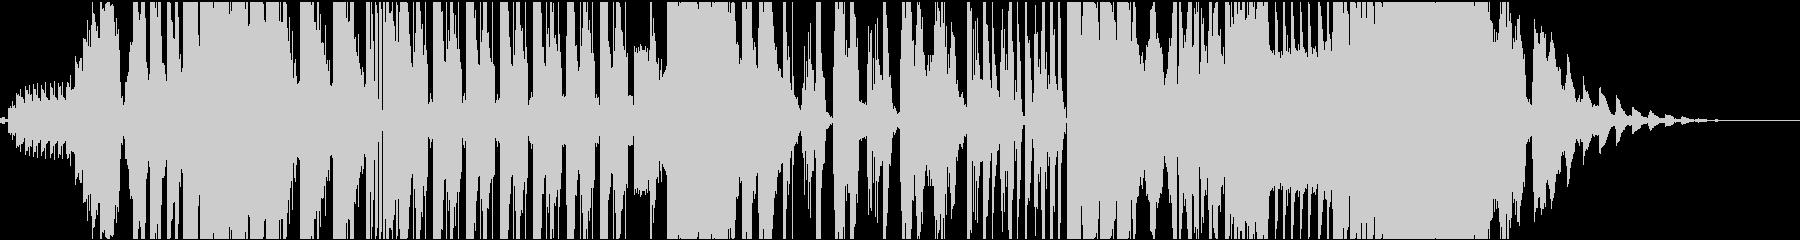 Future POPのチョップのジングルの未再生の波形